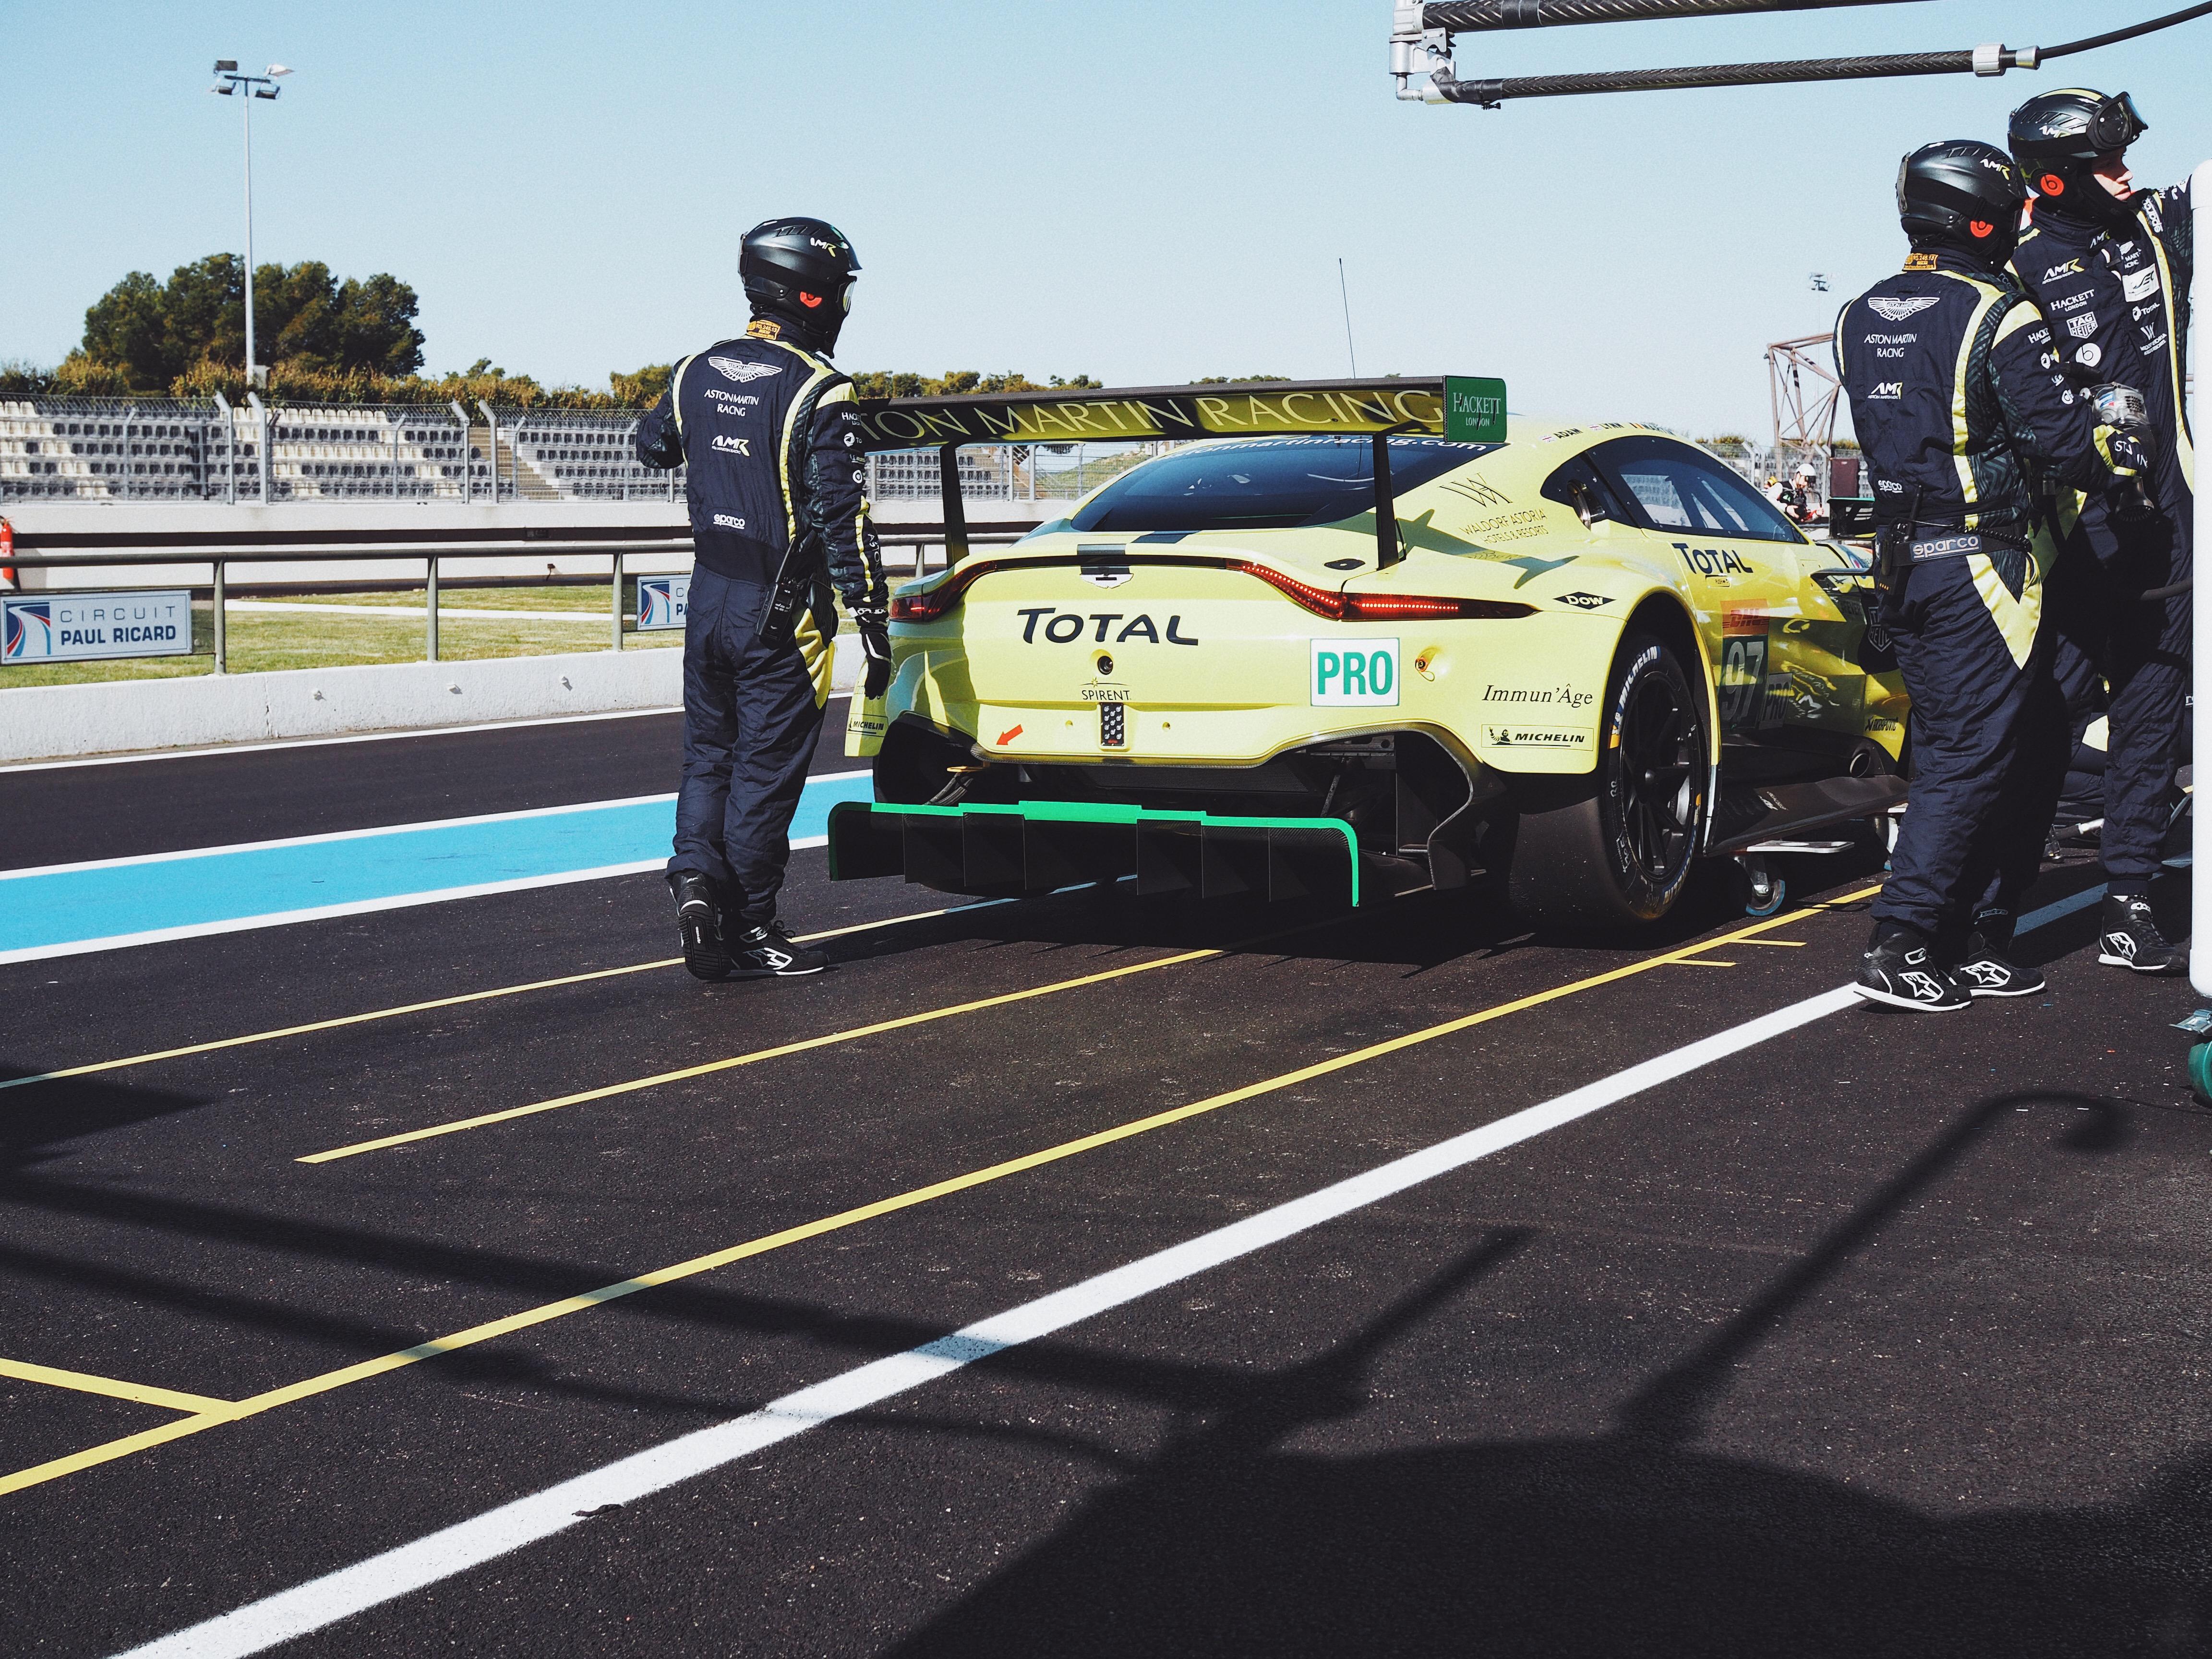 _ilcarritzi_nice_hackett_aston_martin_cote_dazur_french_riviera_paul_ricard_circuit_racing_cars_formula_1_